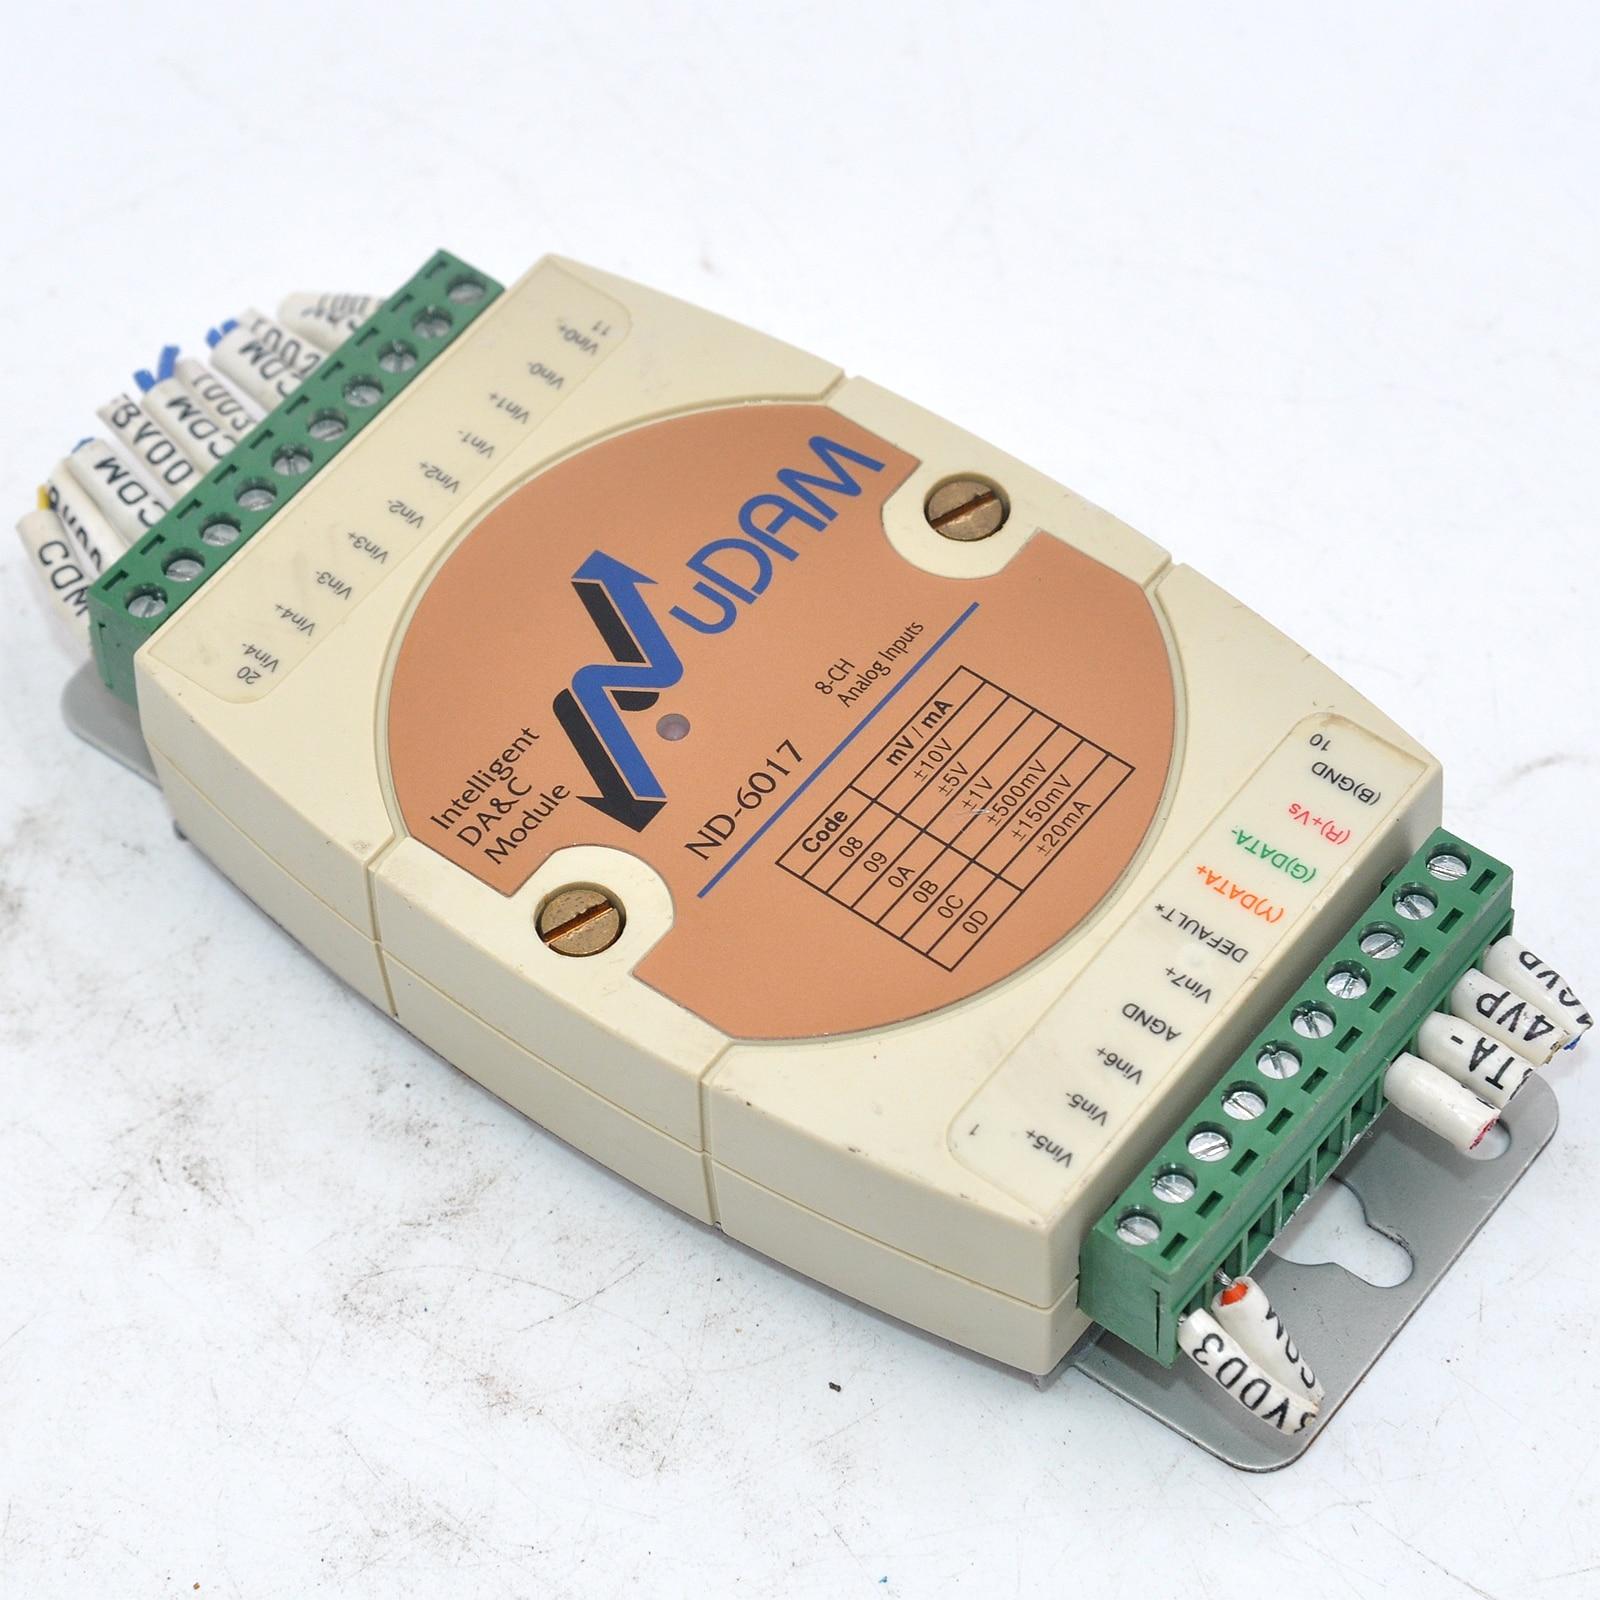 ADLINK  ND-6017  8-CH Analog Input Module